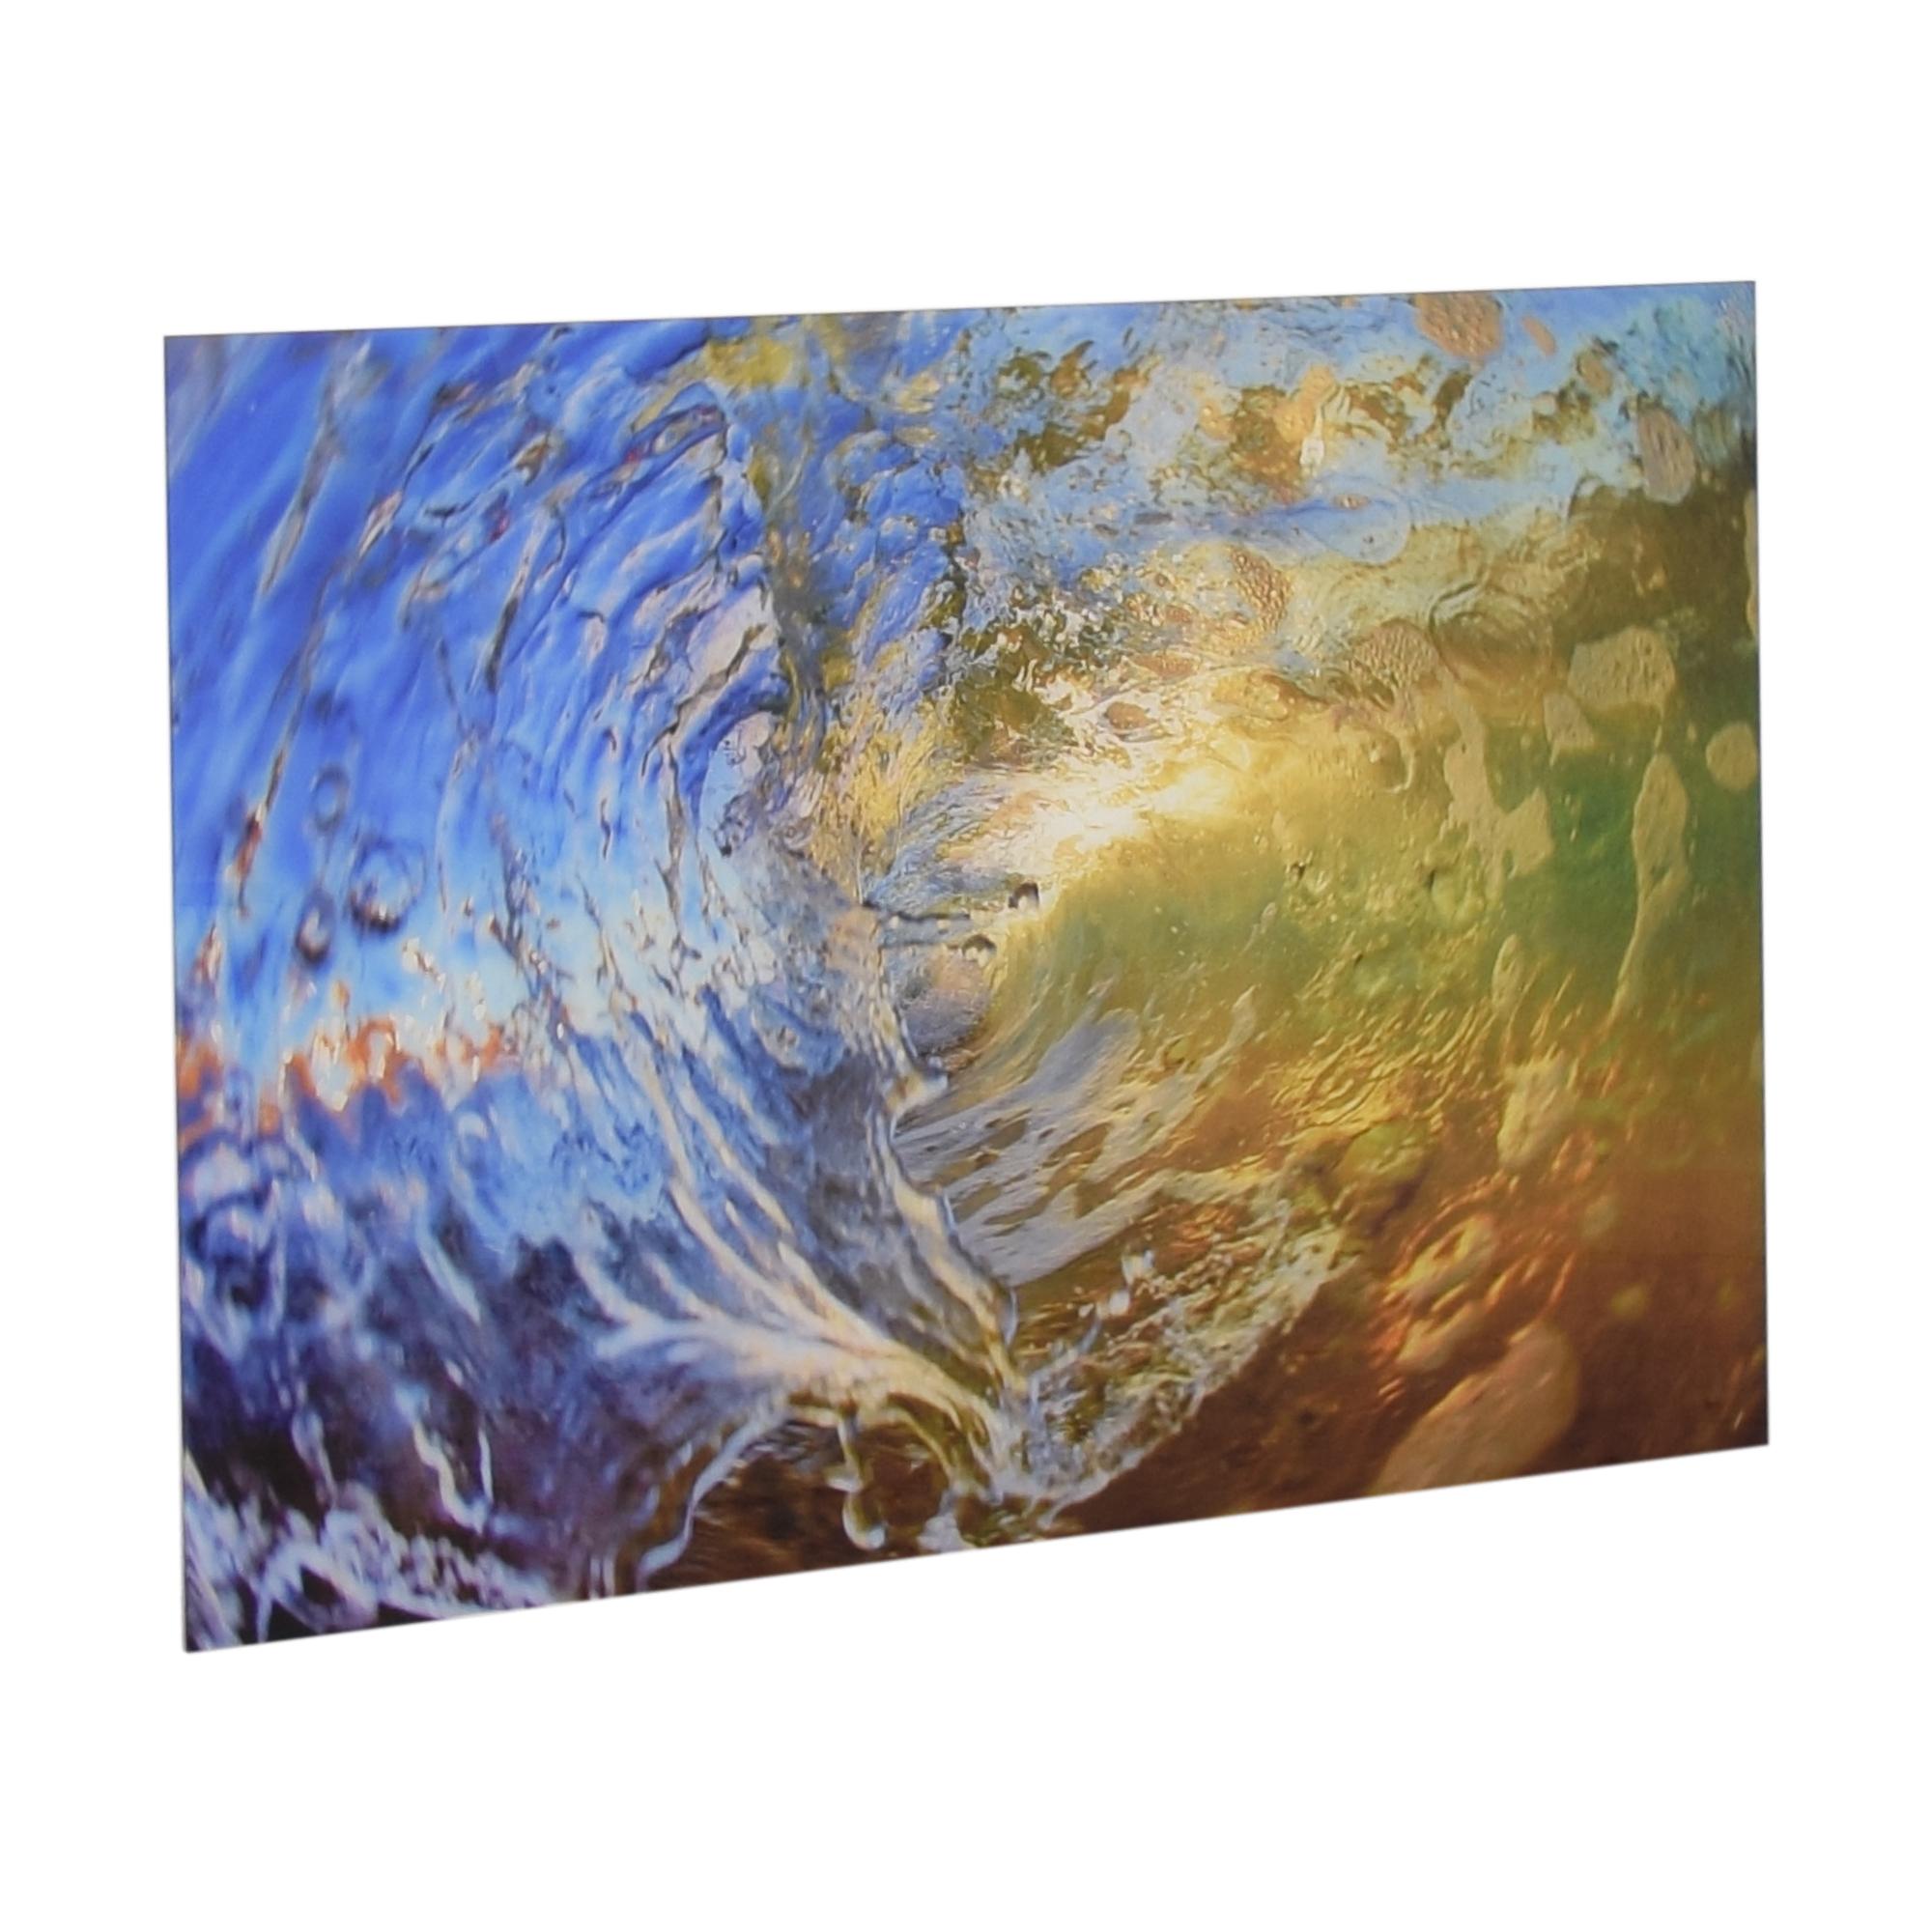 Aquabumps Bondi Chamber Art Print